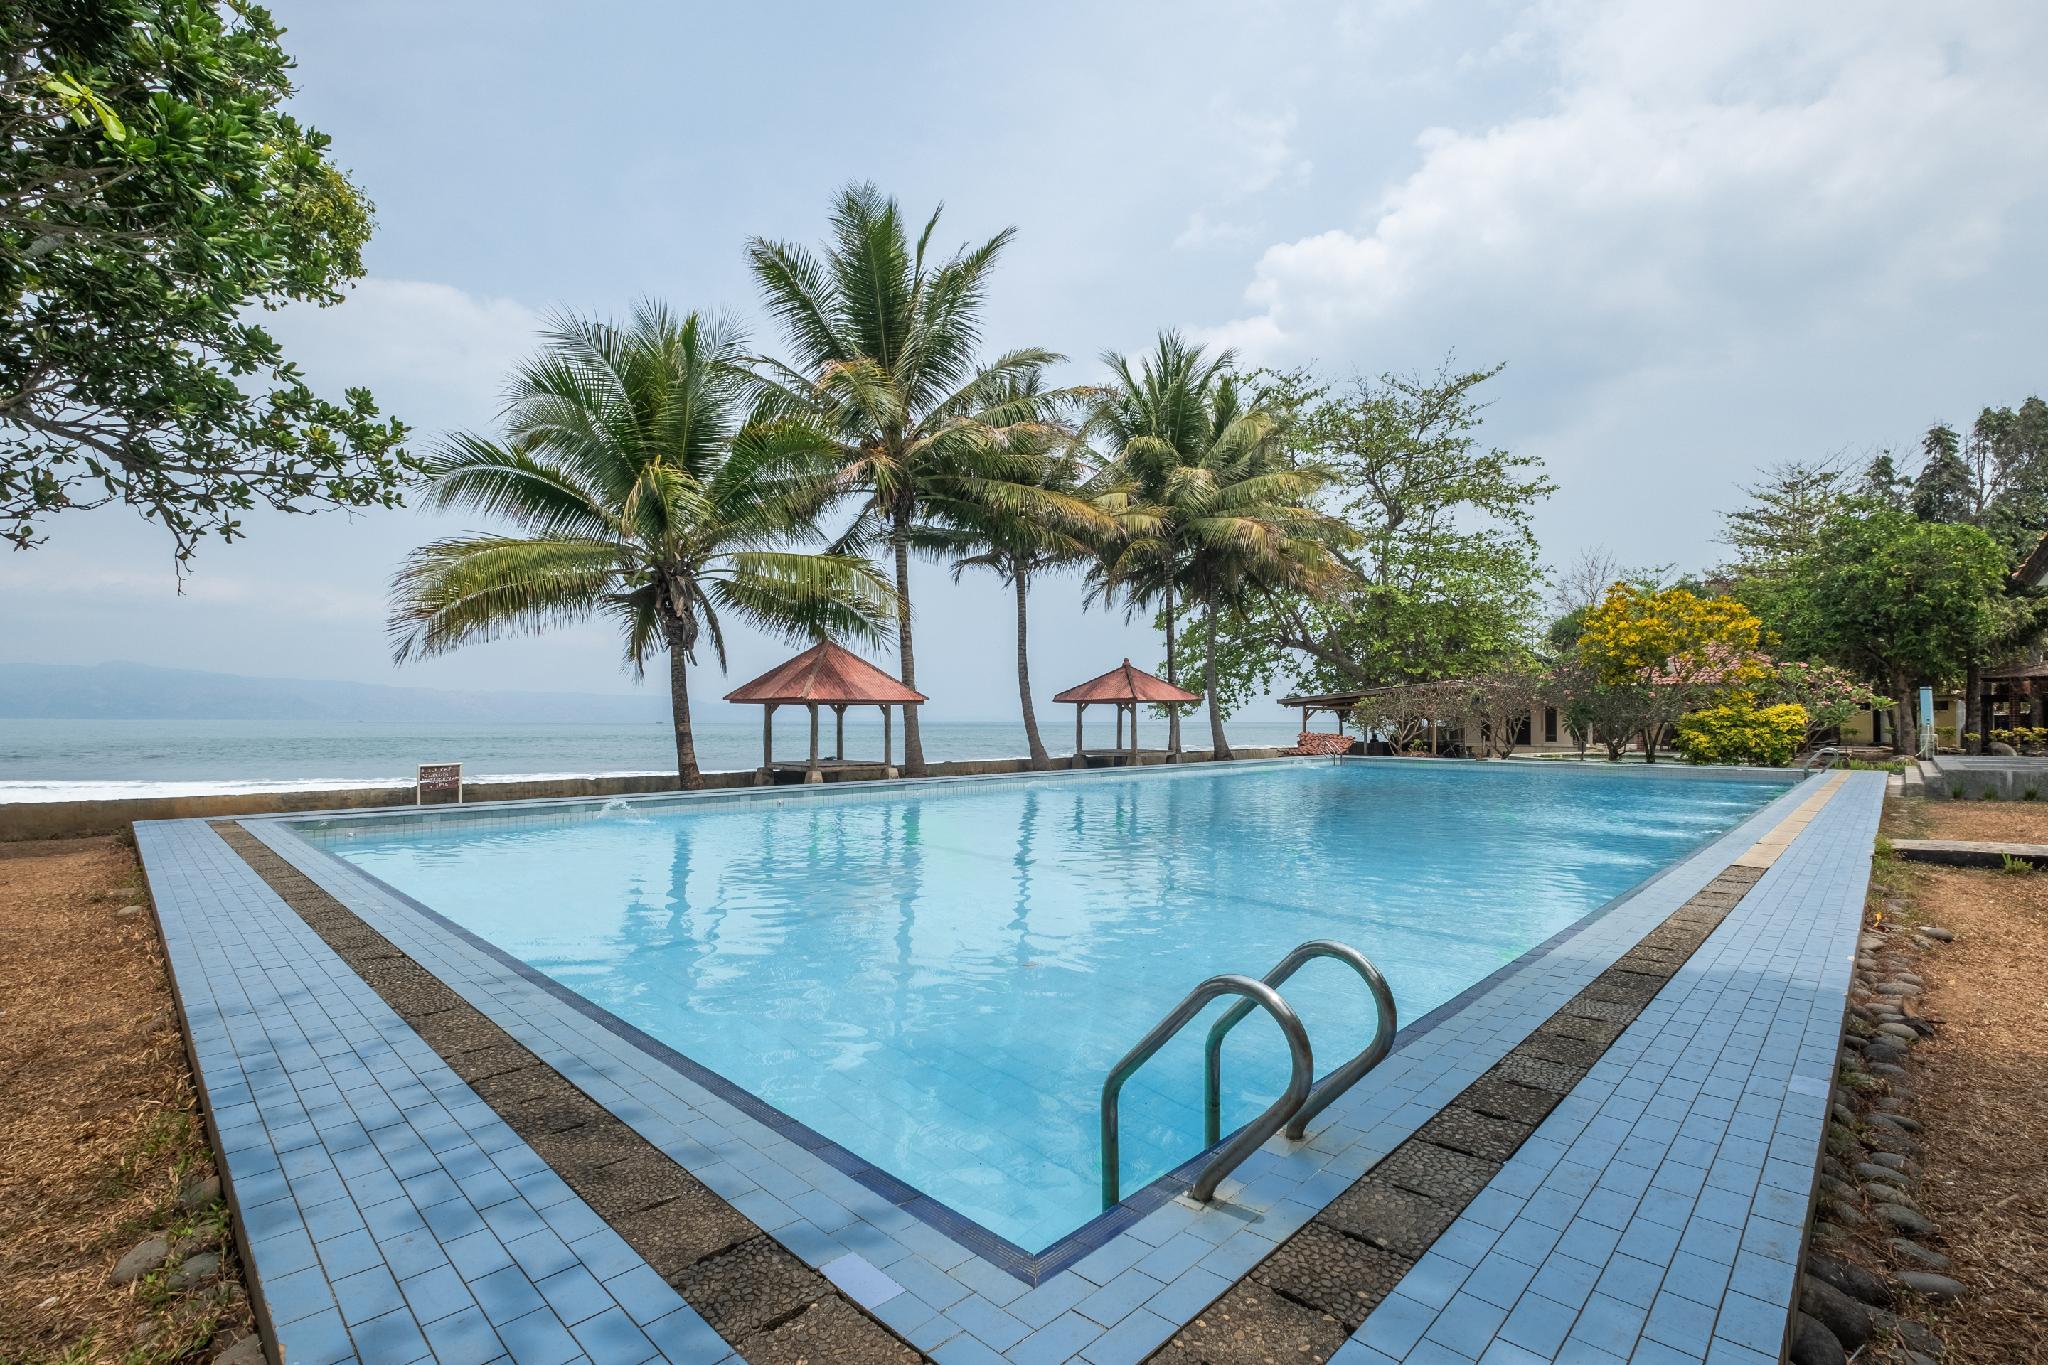 OYO 951 Cempaka Ratu Beach Resort